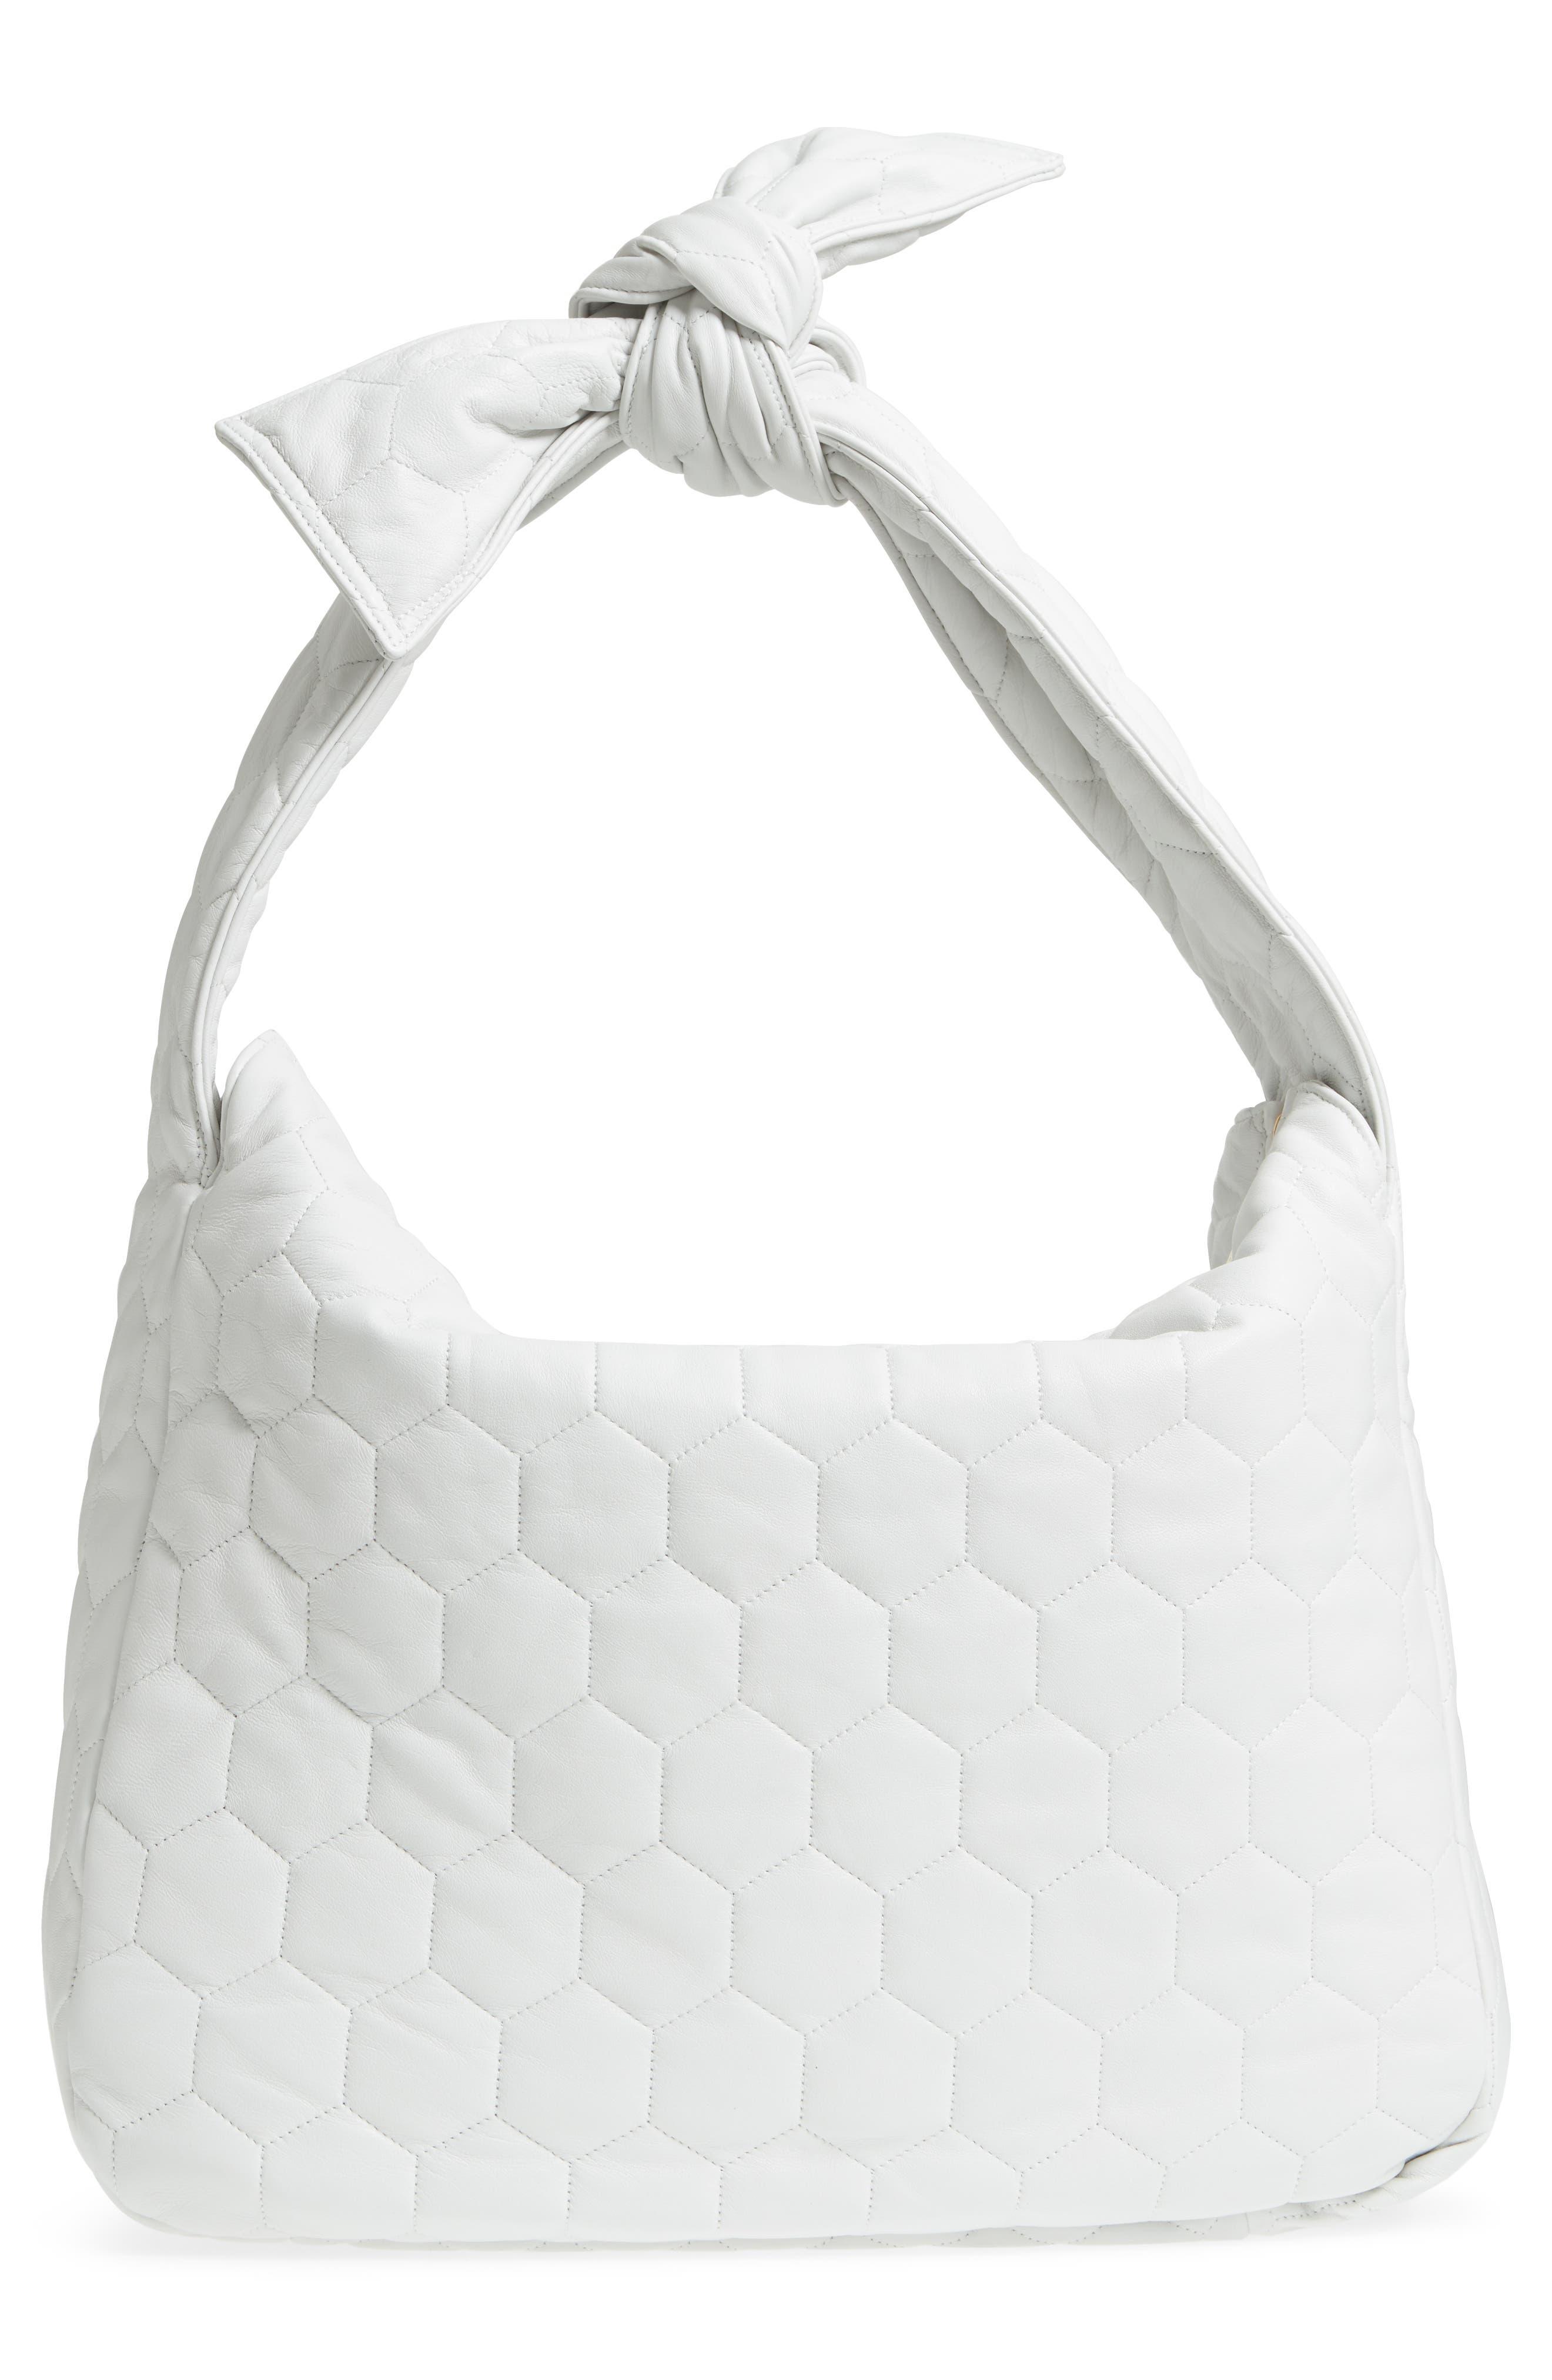 Balloon Leather Shoulder Bag,                             Alternate thumbnail 3, color,                             White